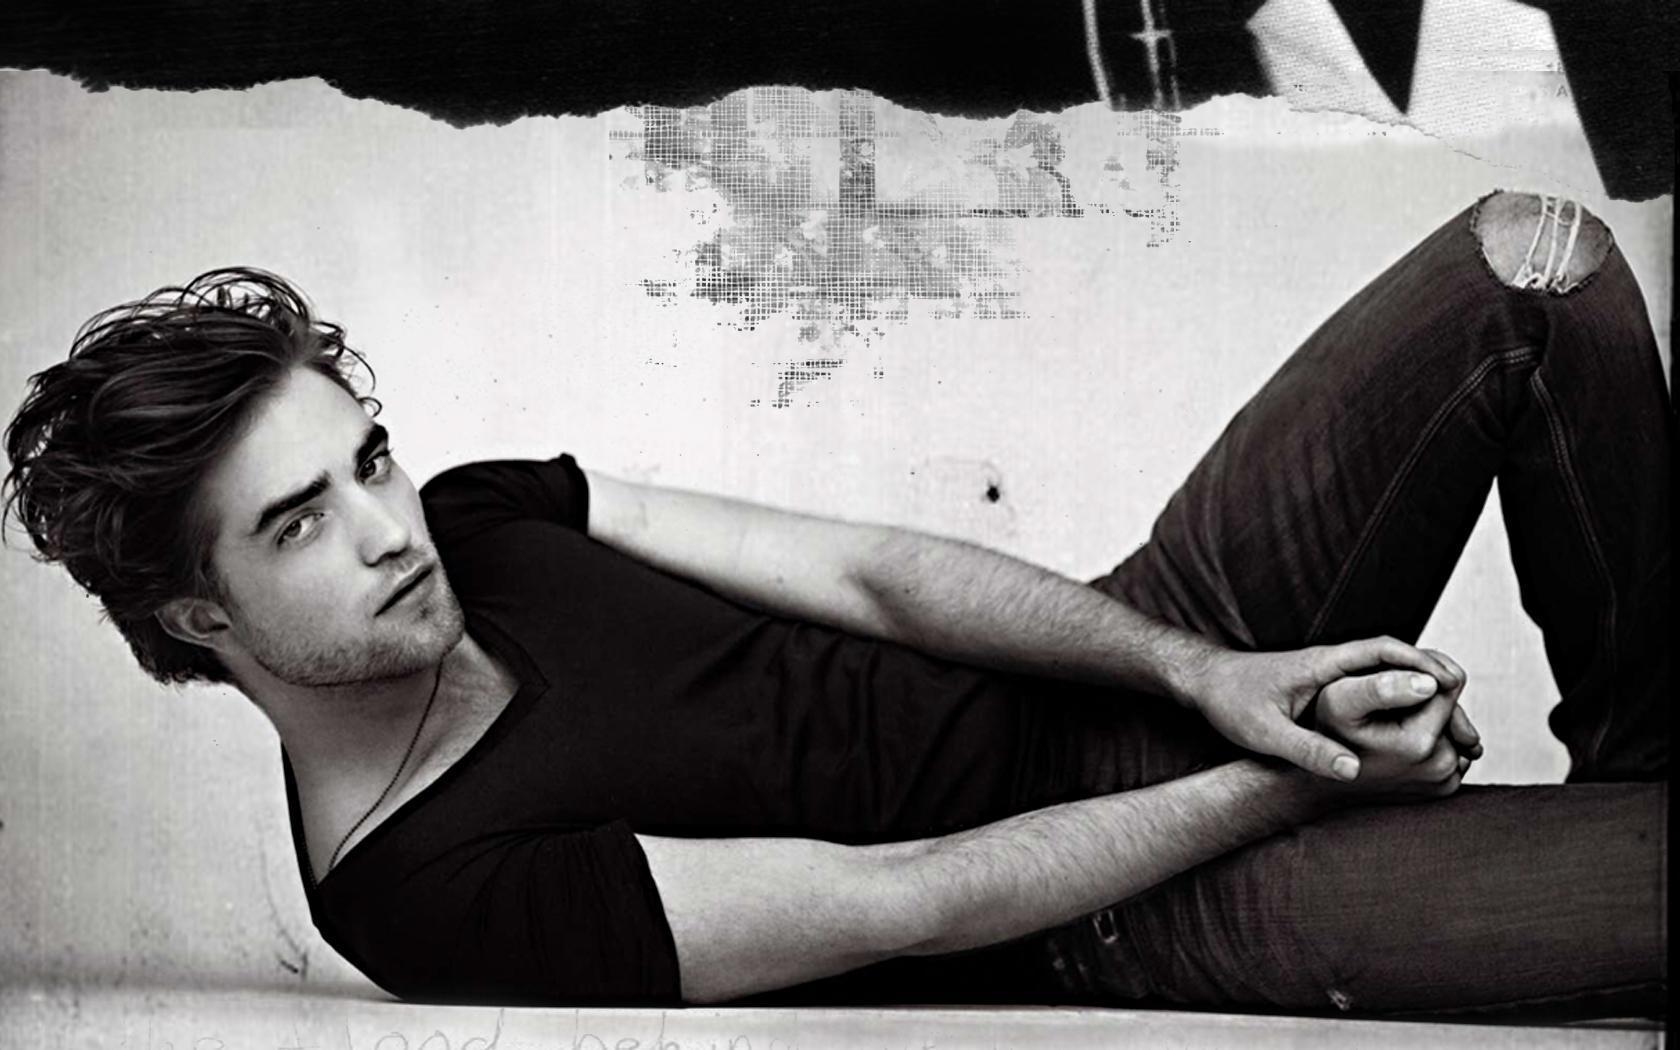 Robert Pattinson - robert-pattinson wallpaper